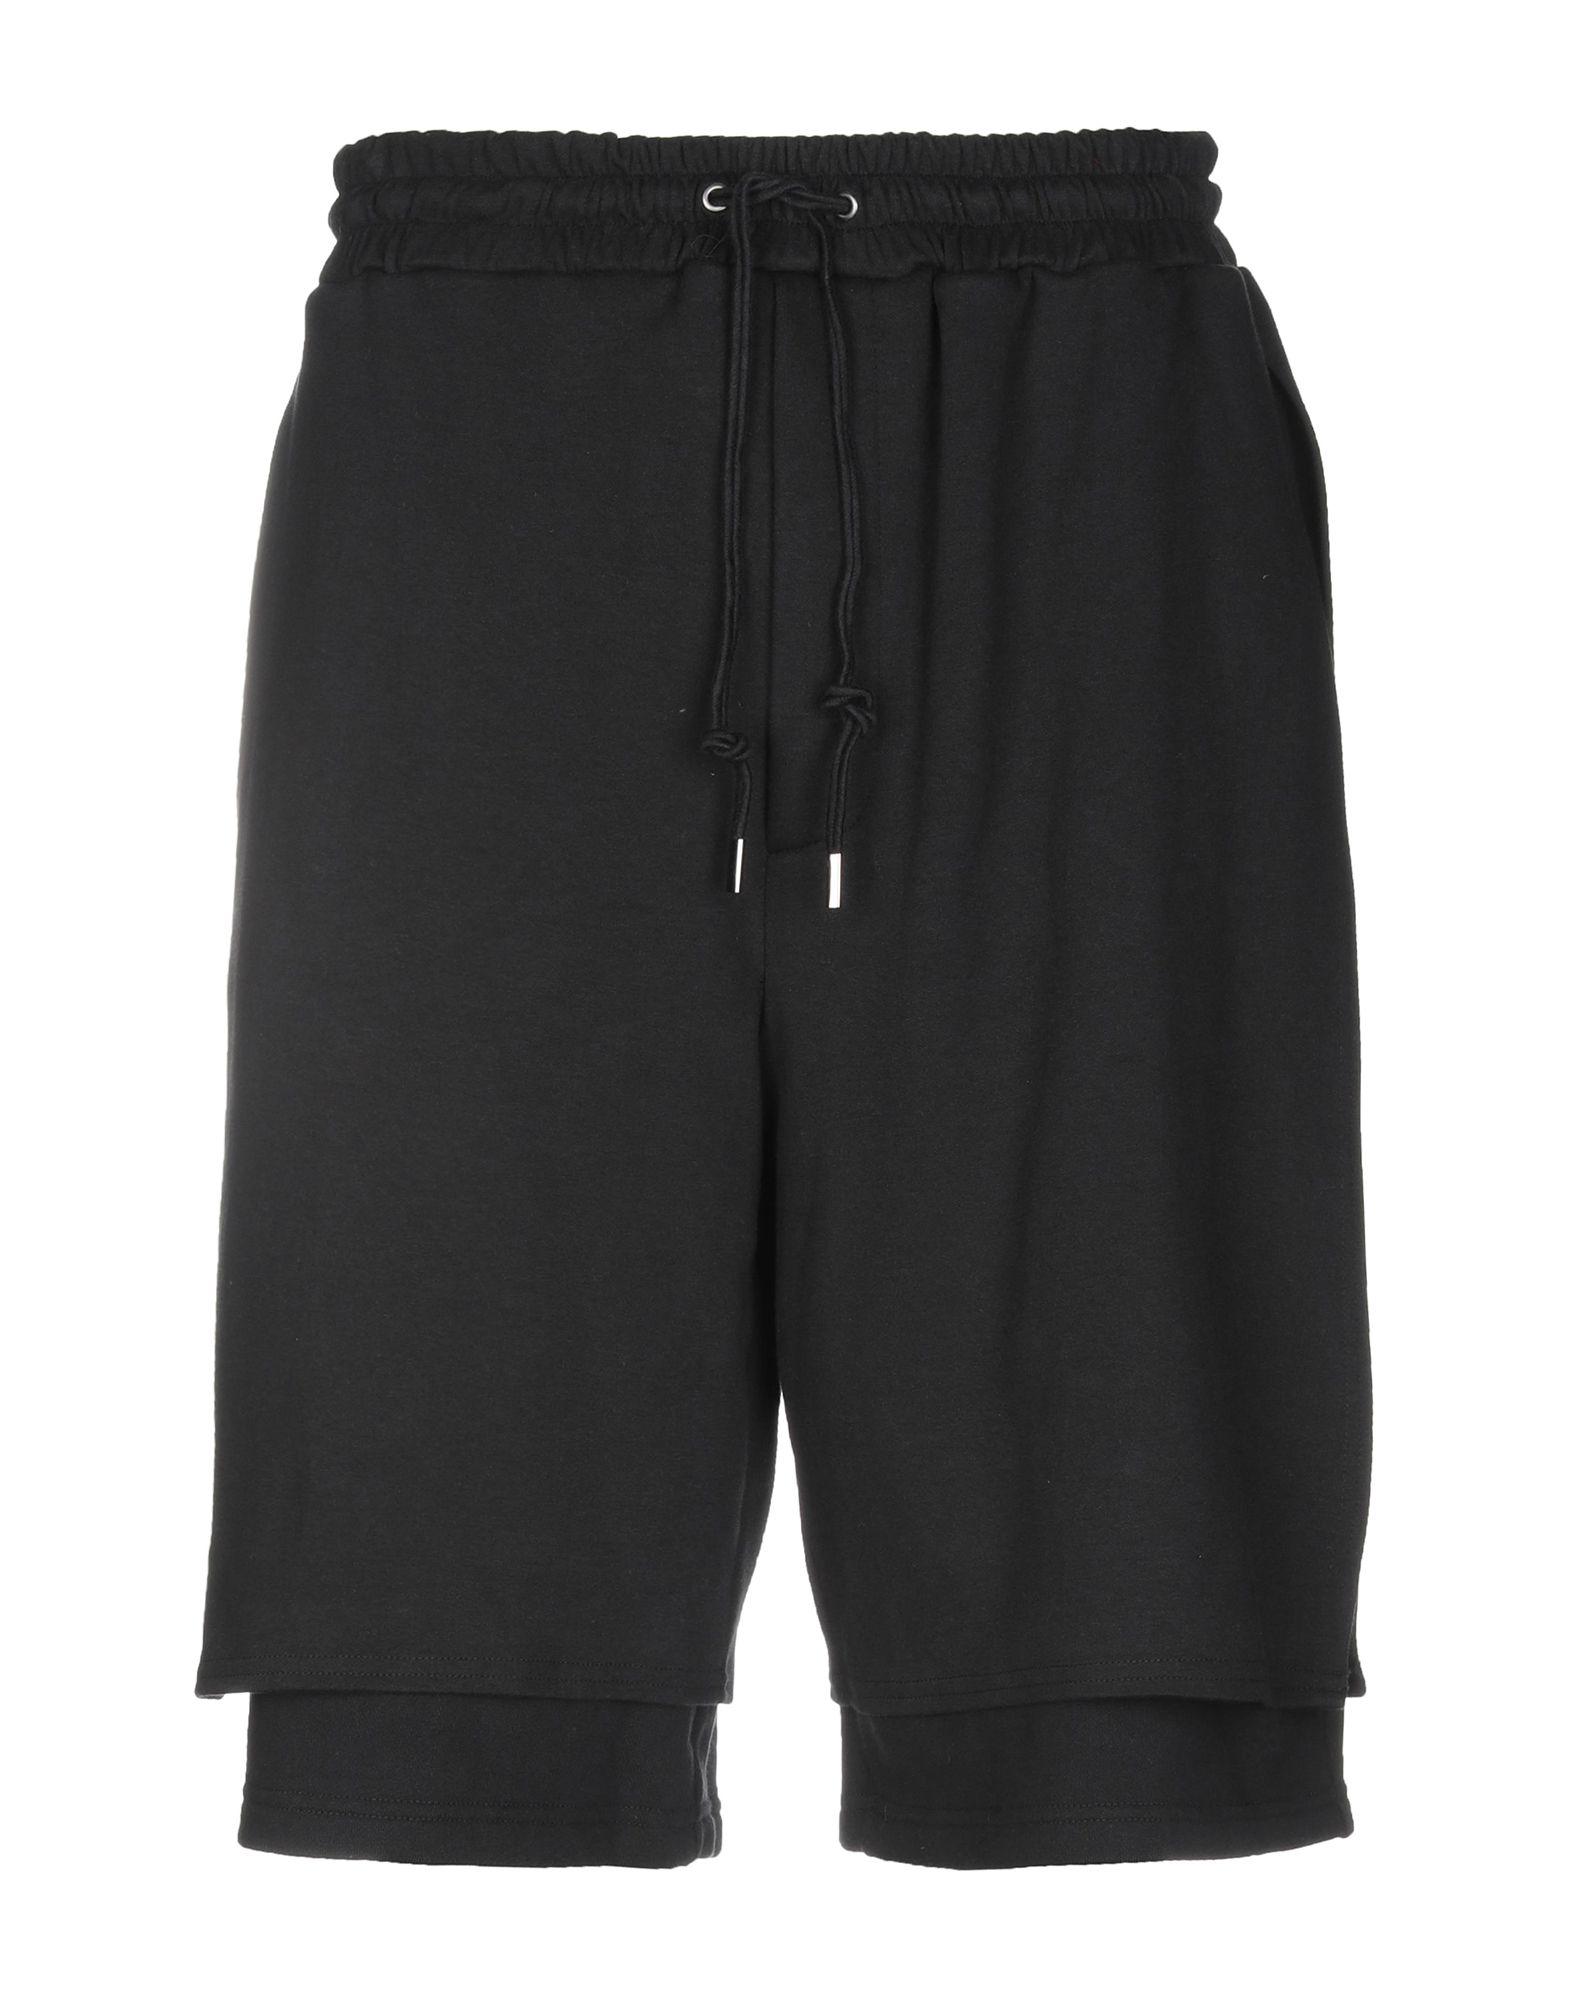 Pantalone Pantalone Pantalone Felpa D.Gnak By Kang.D uomo - 13241950NE 49a